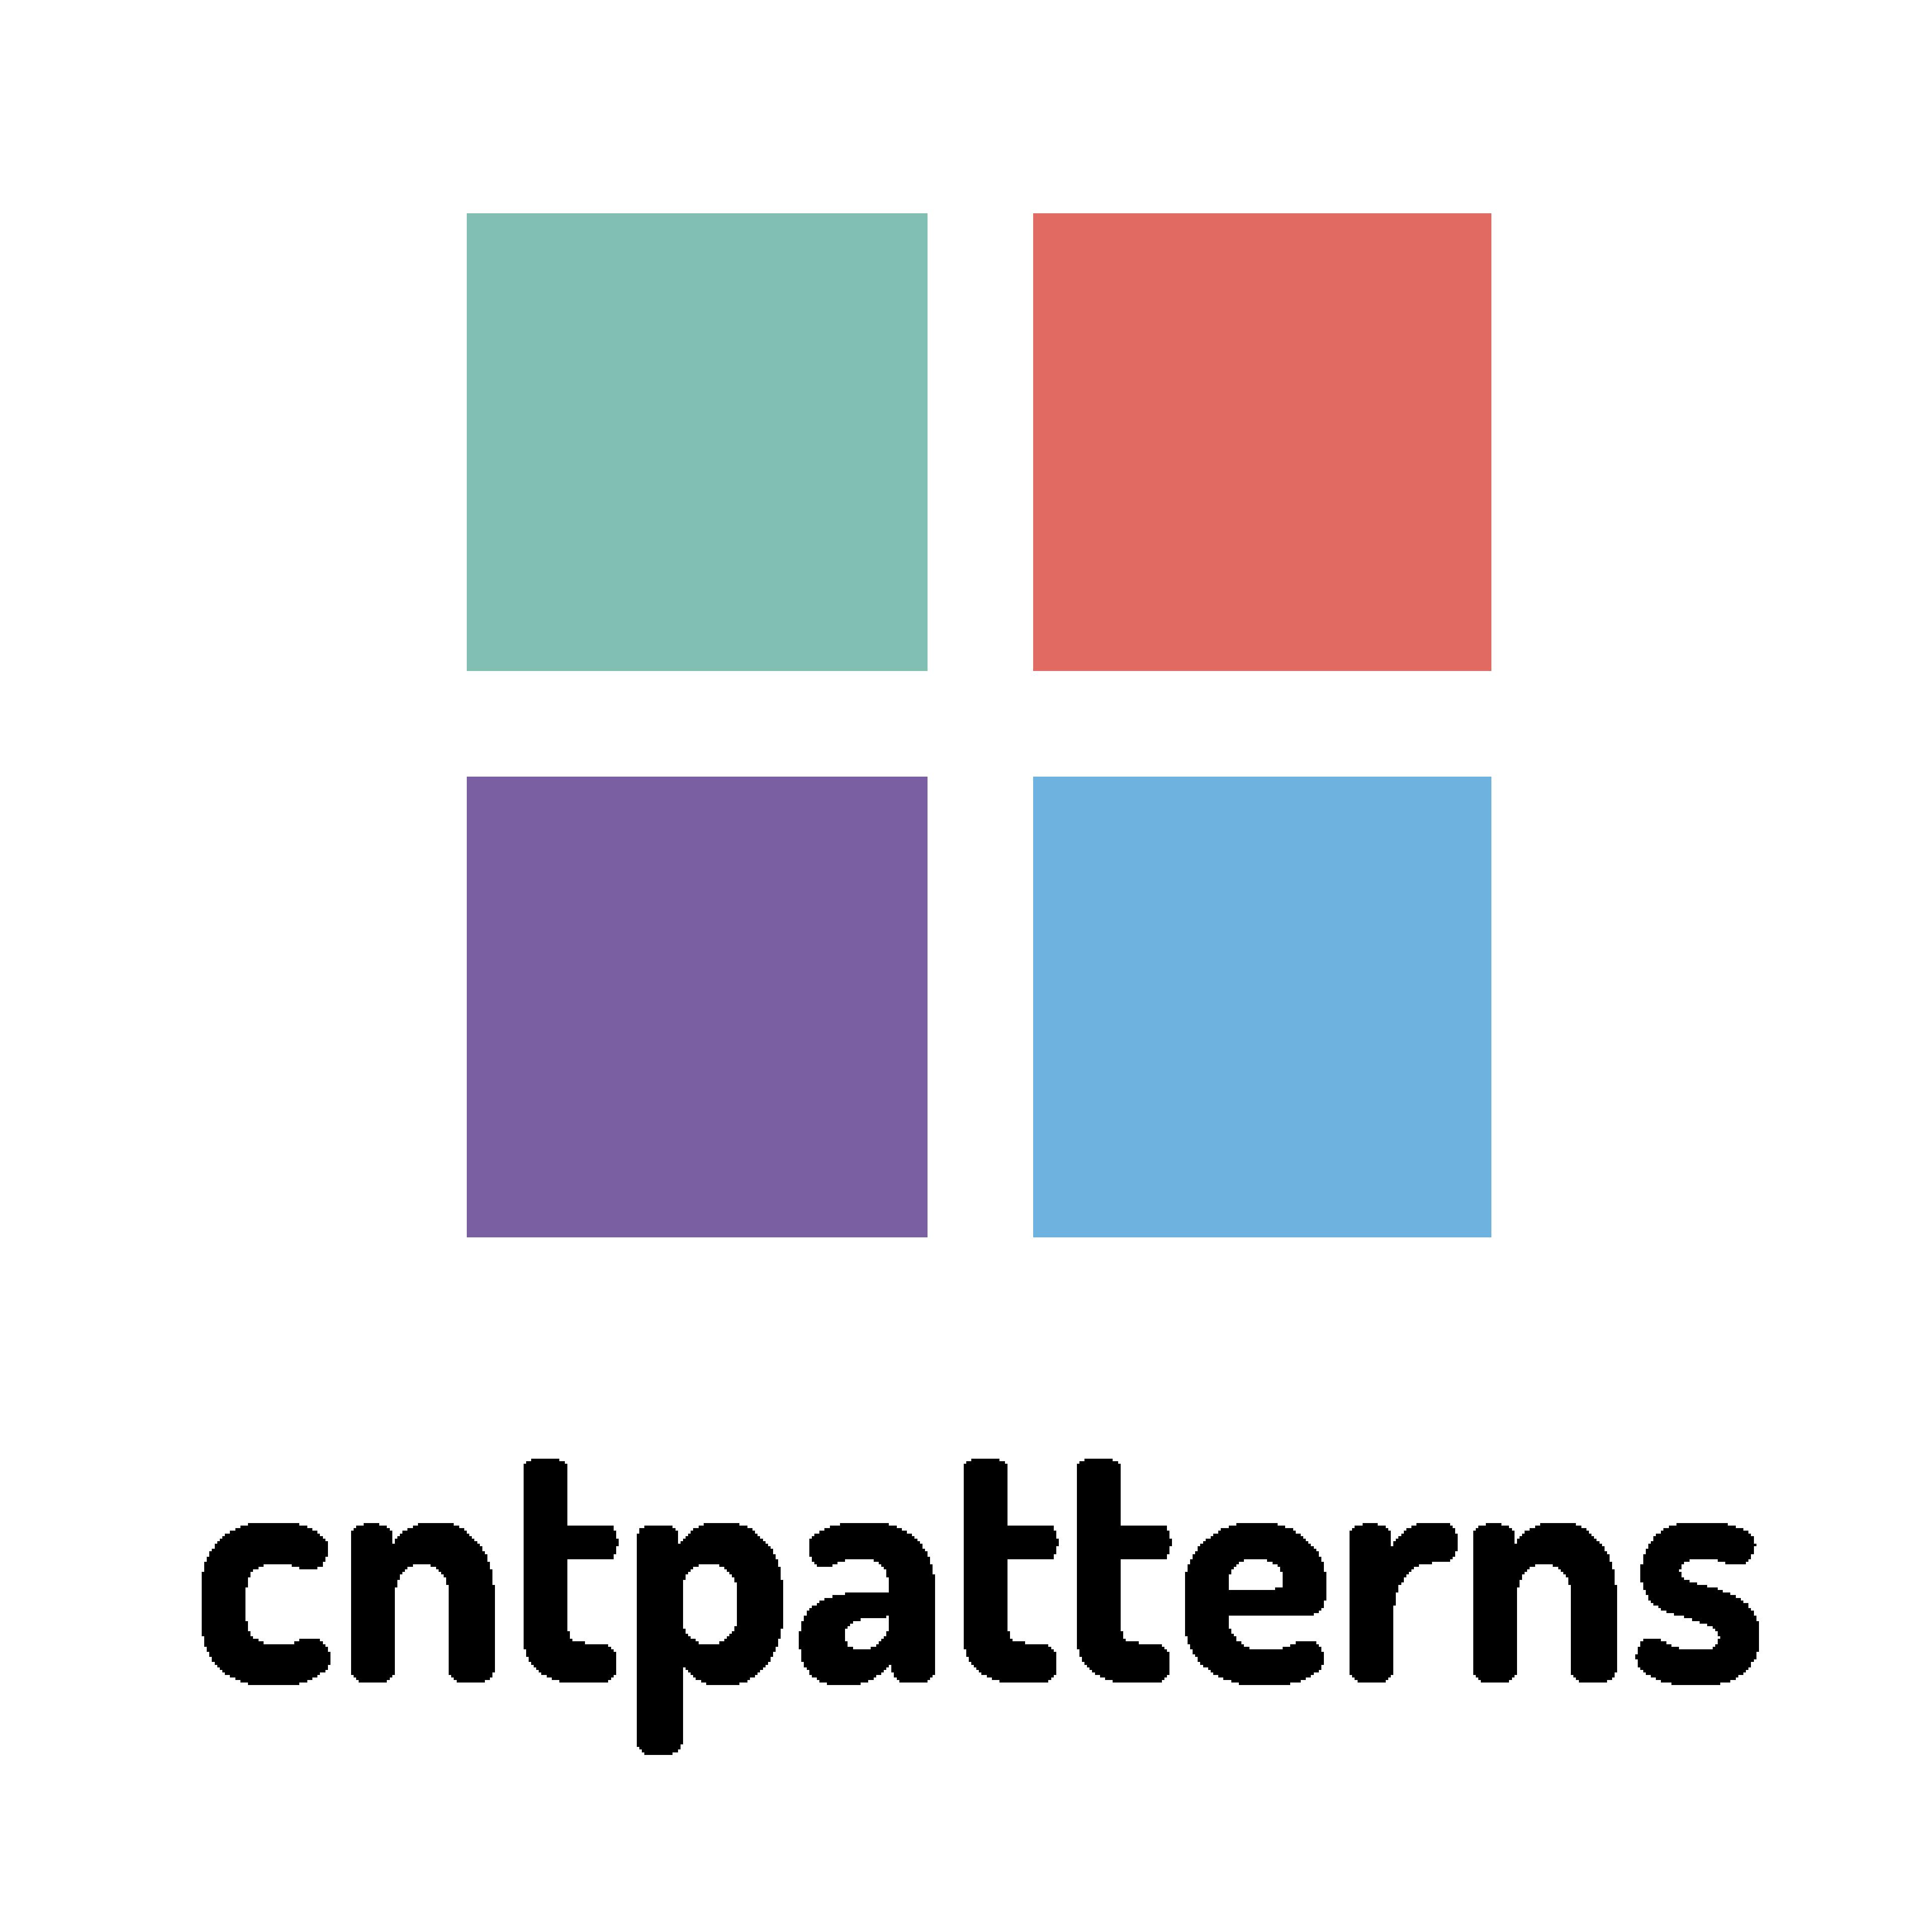 cntpatterns